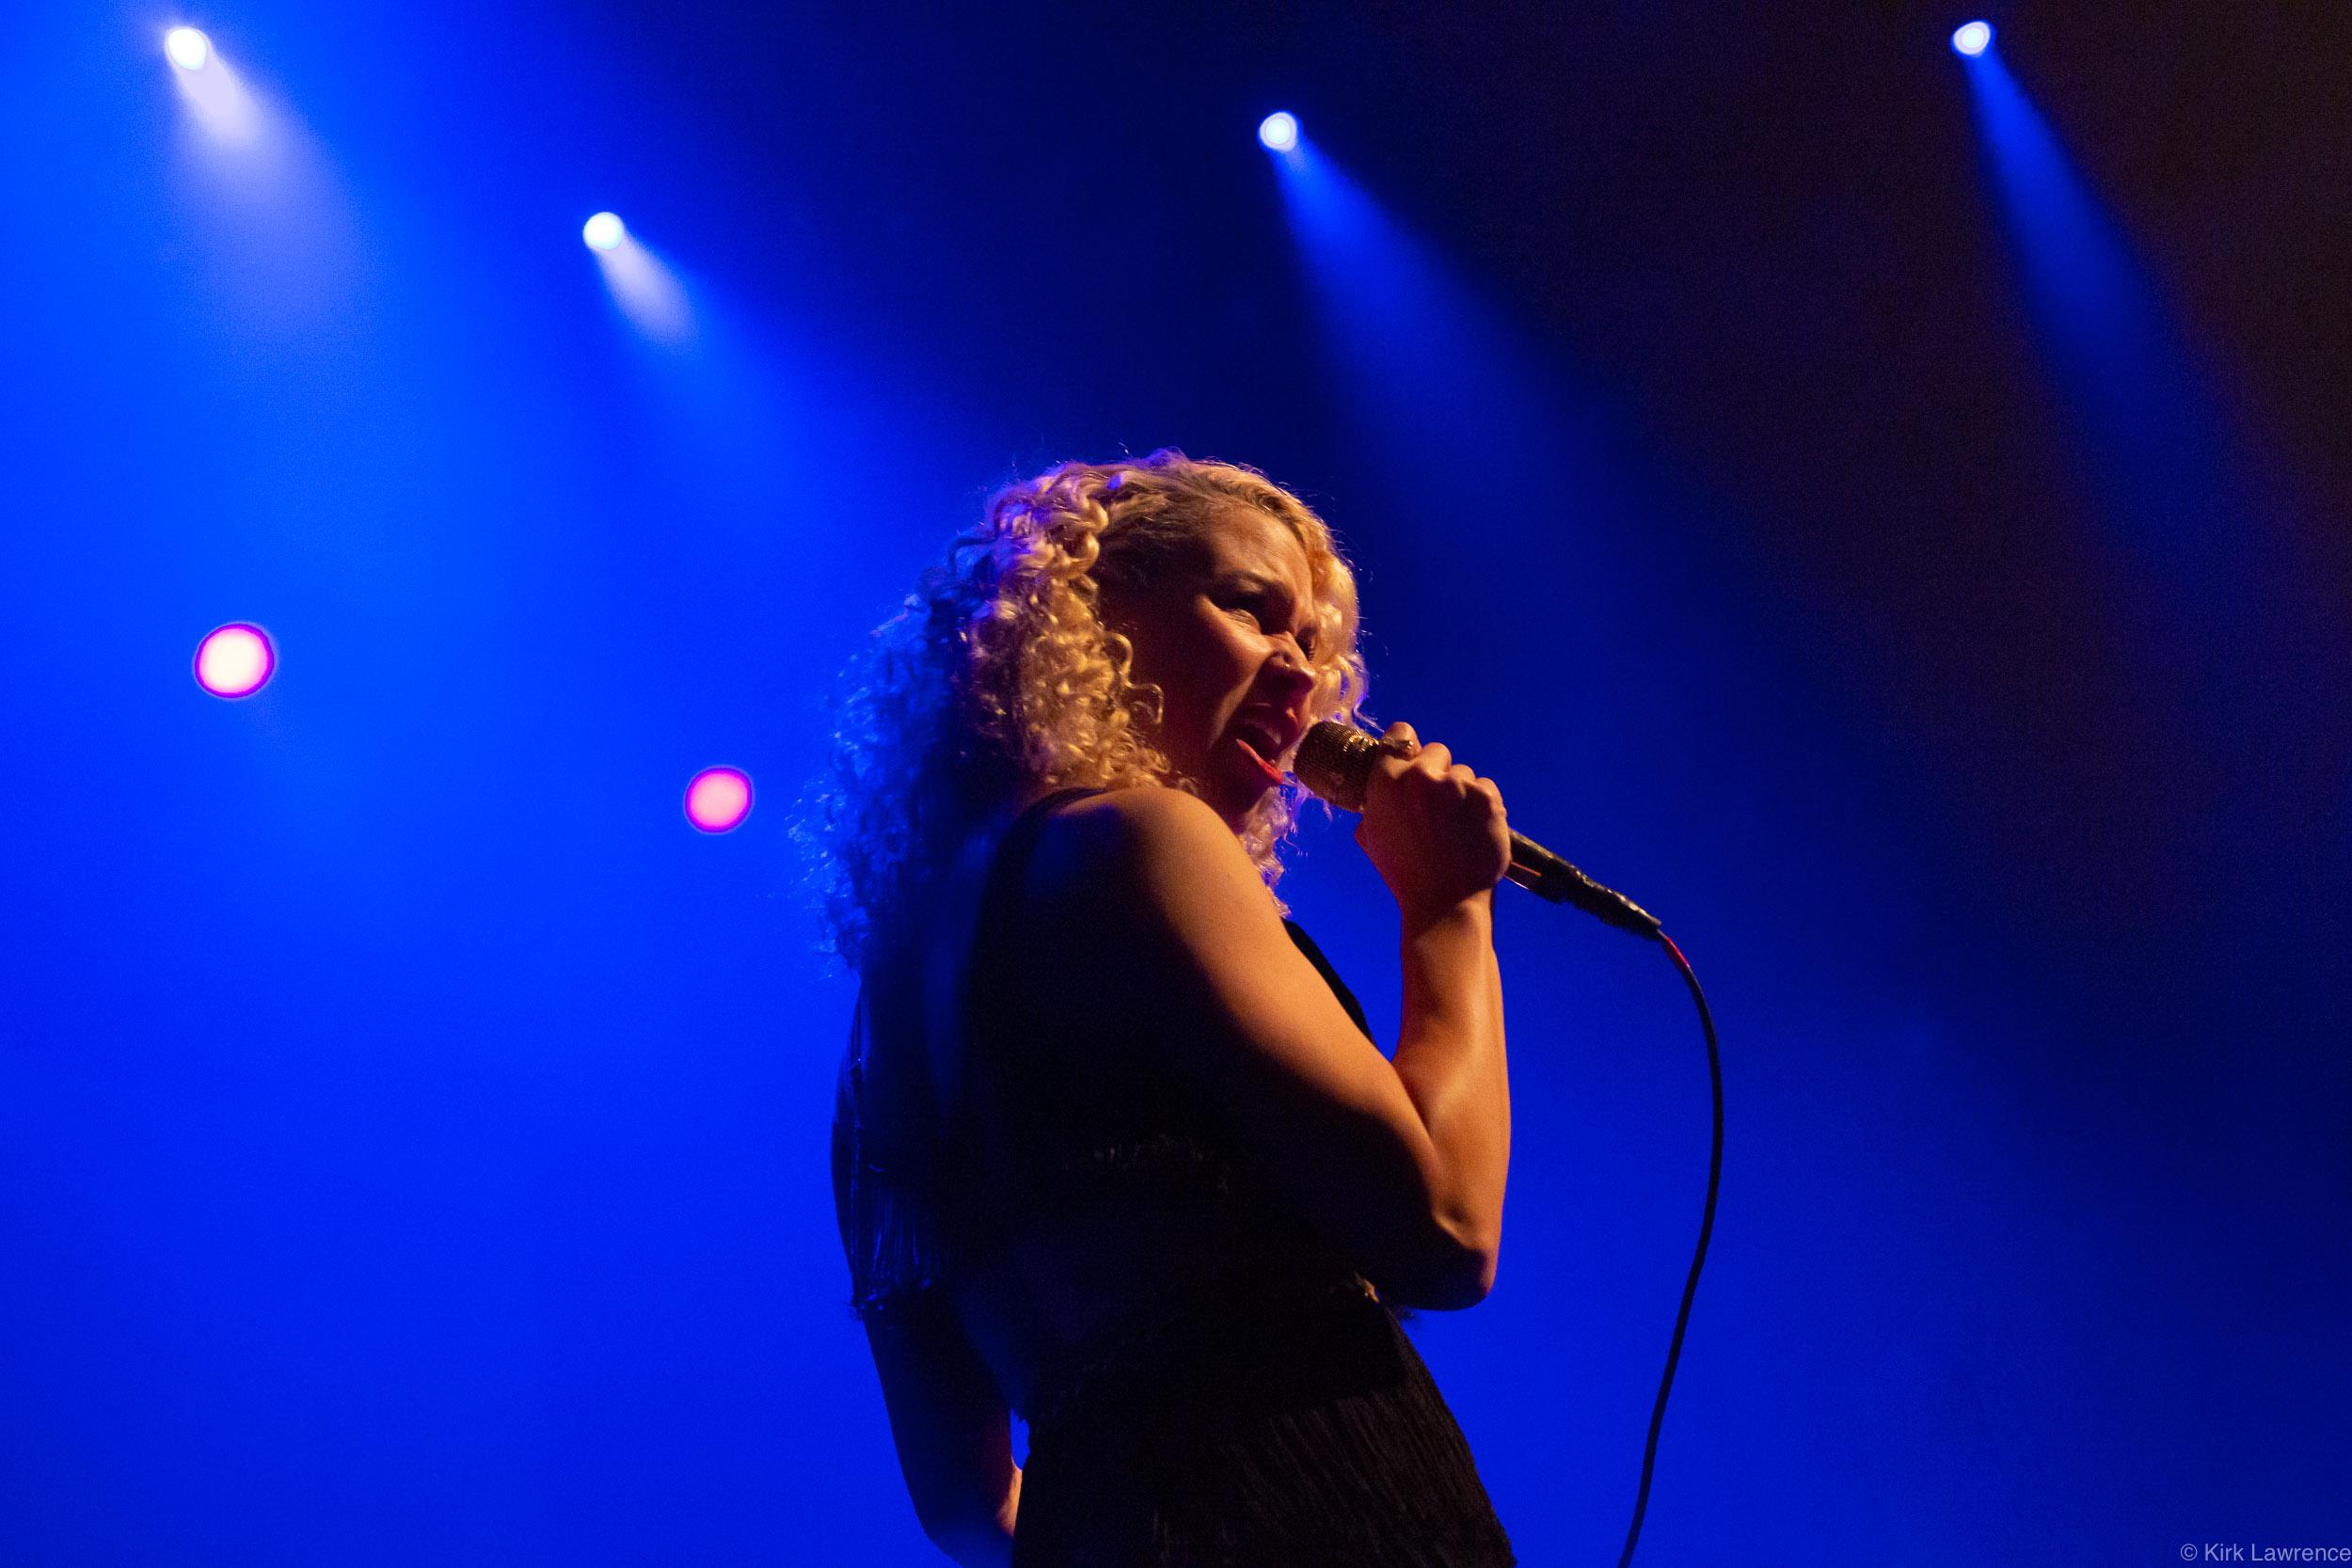 Liza_Colby_Gramercy_Theater_New_York_City_concert.jpg